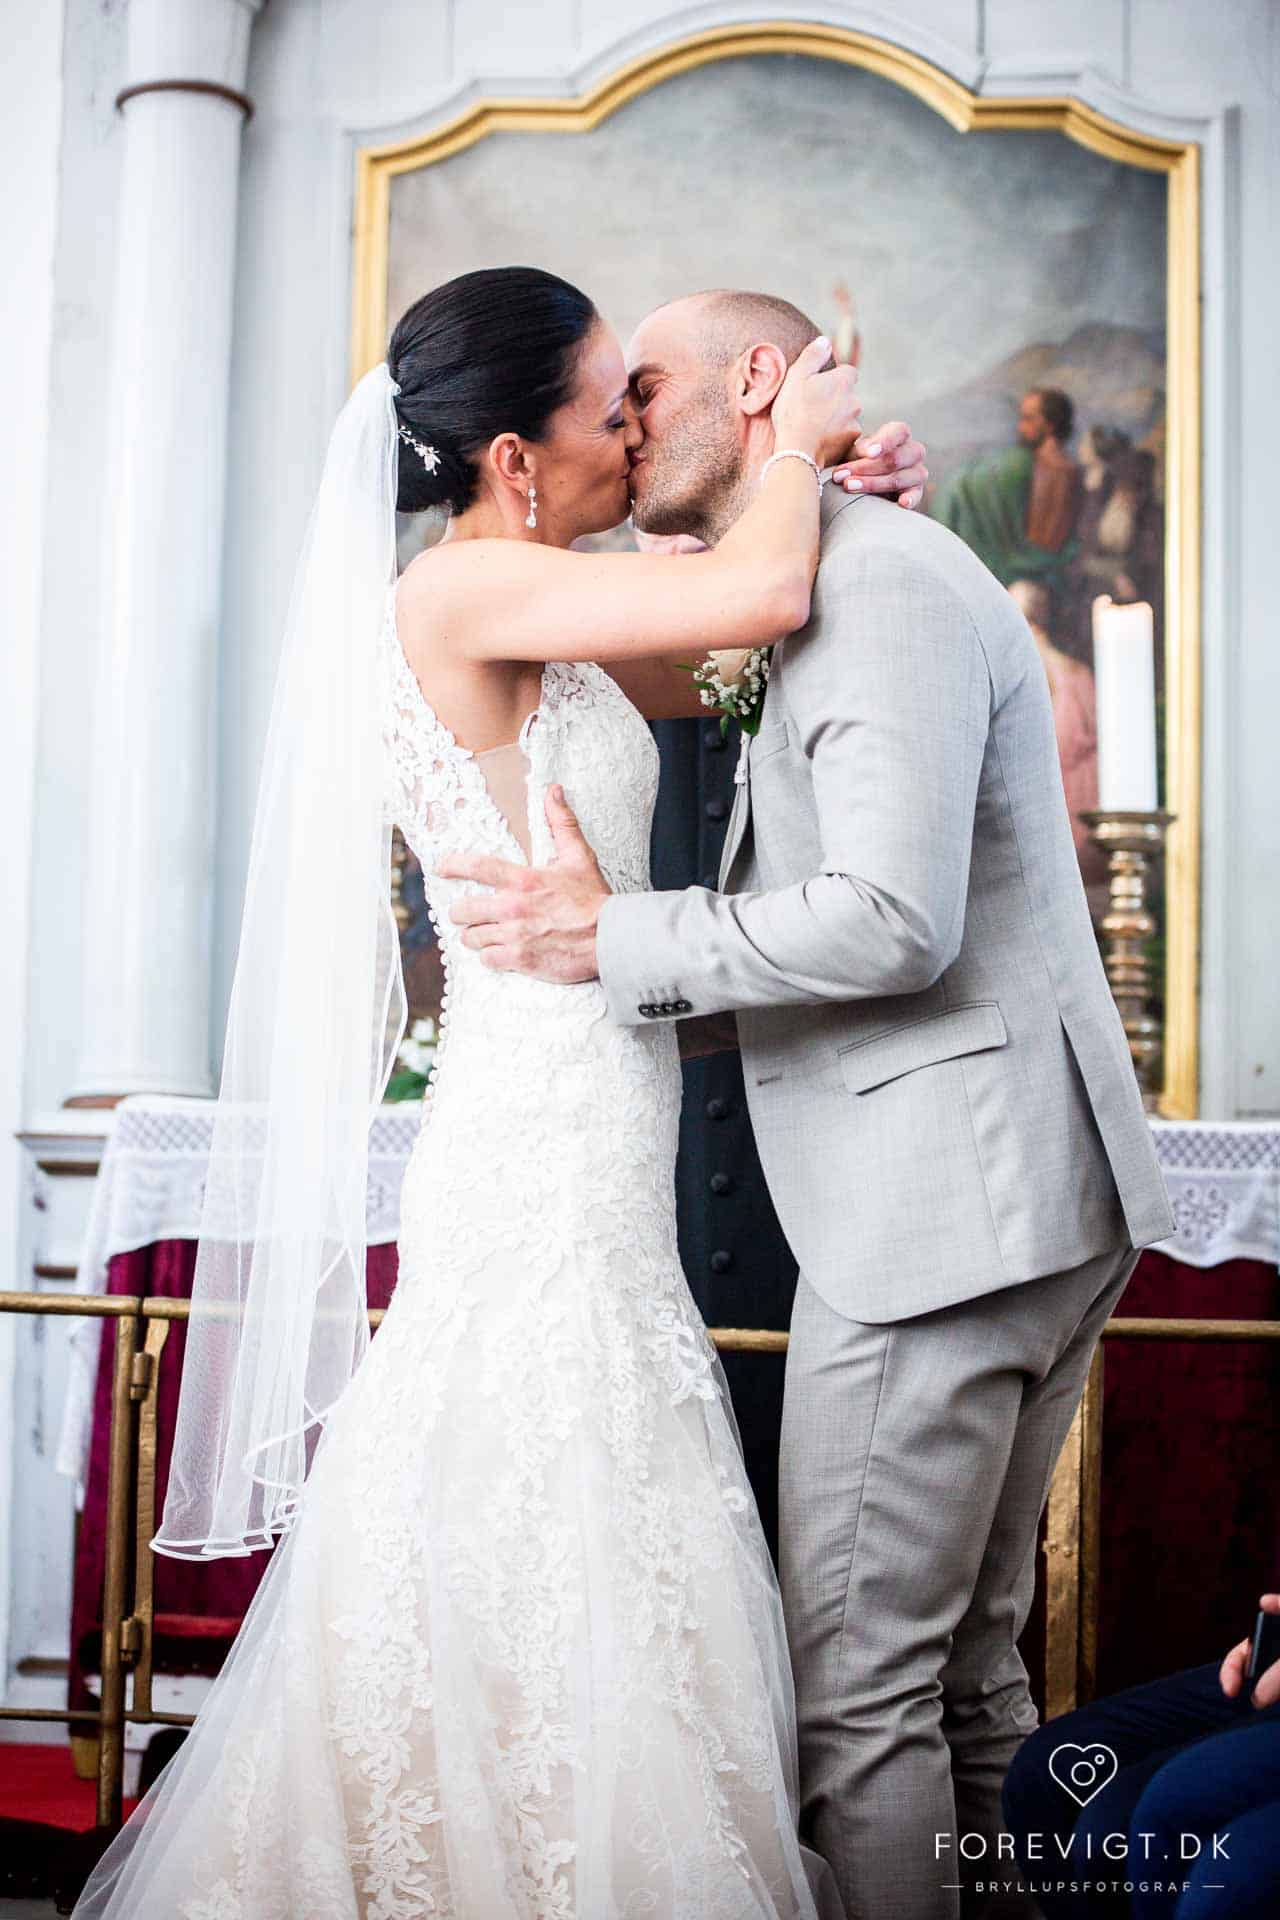 Wedding reception with wedding cake